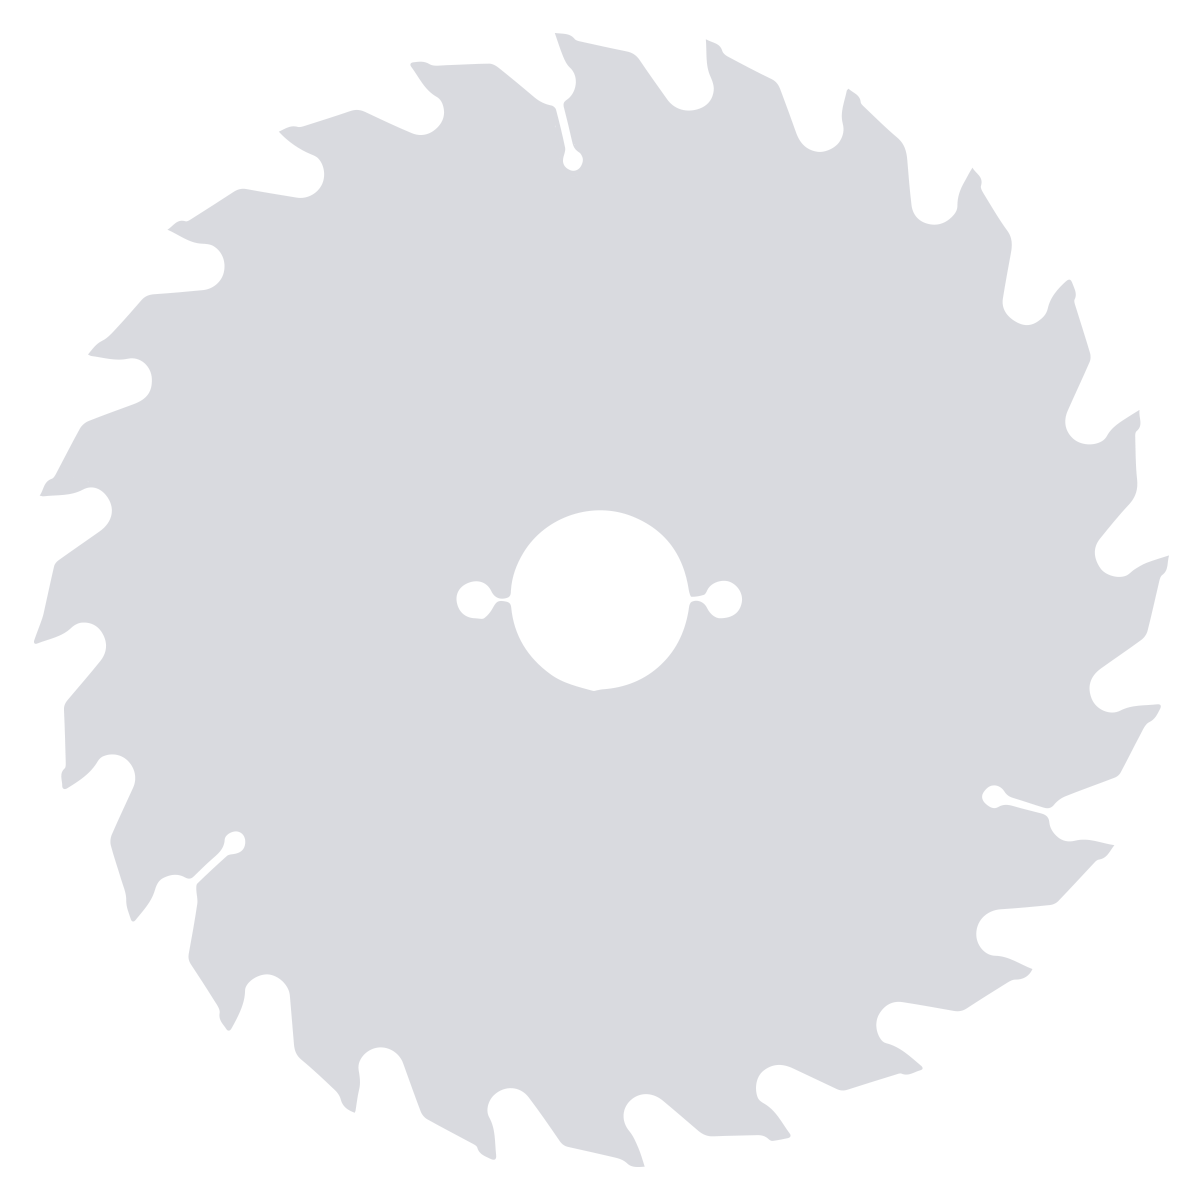 jpg free stock Circular saws clip art. Blade clipart table saw blade.